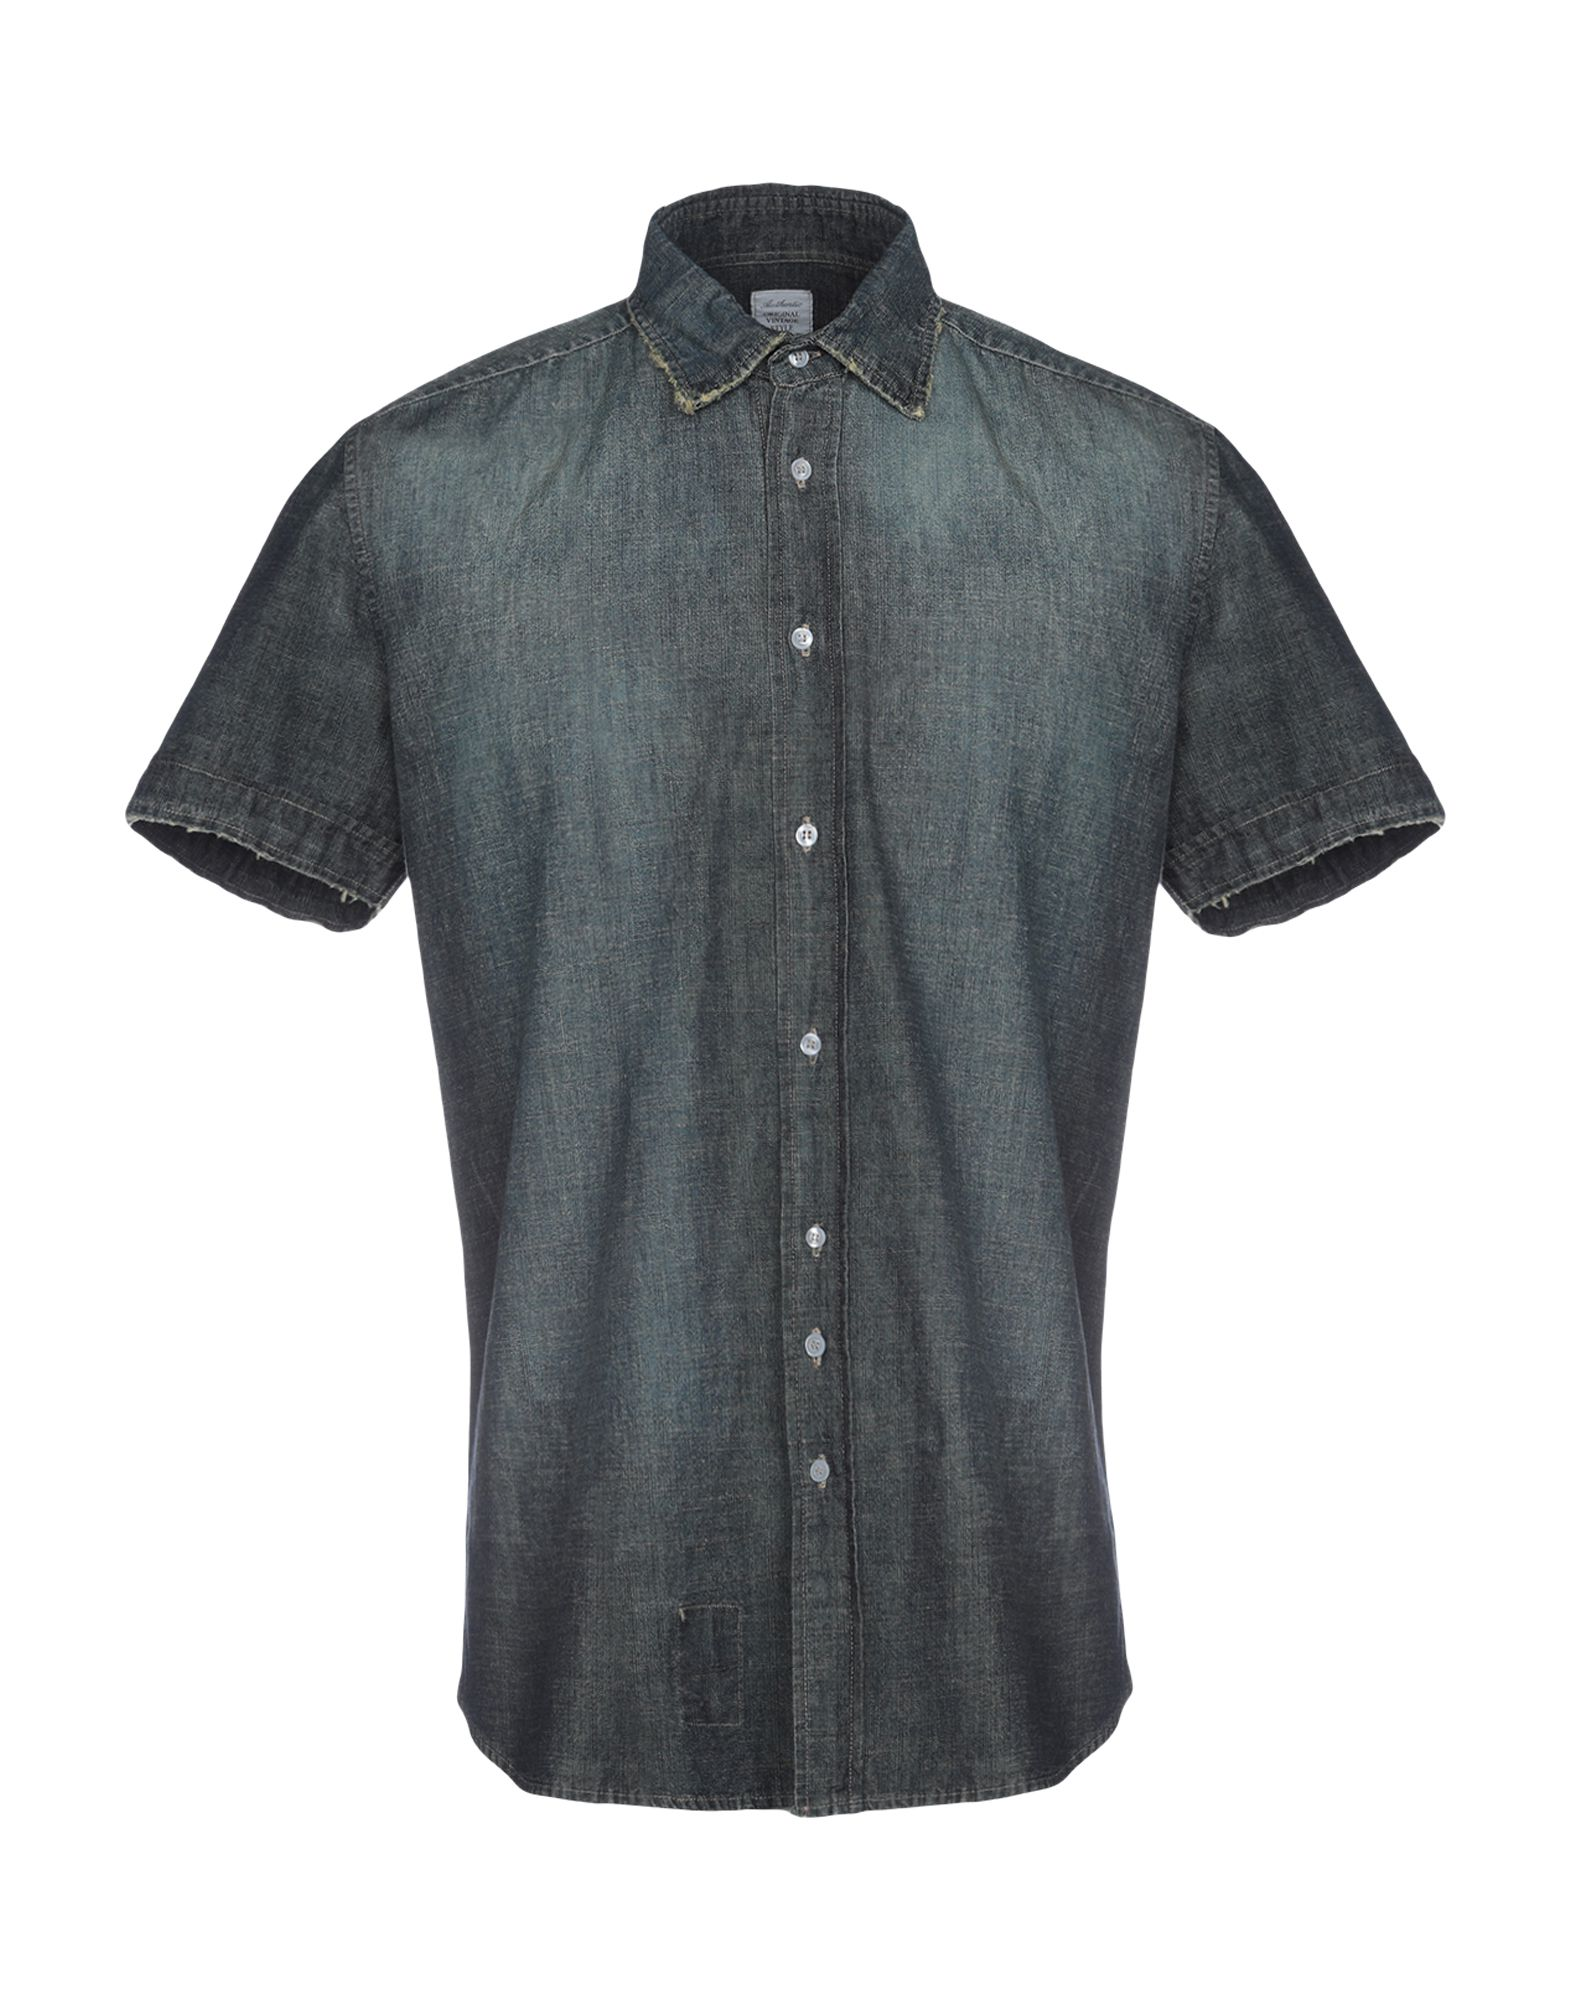 AUTHENTIC ORIGINAL VINTAGE STYLE Джинсовая рубашка [zob] original original j7kna 09 10 220v contactor original authentic 2pcs lot